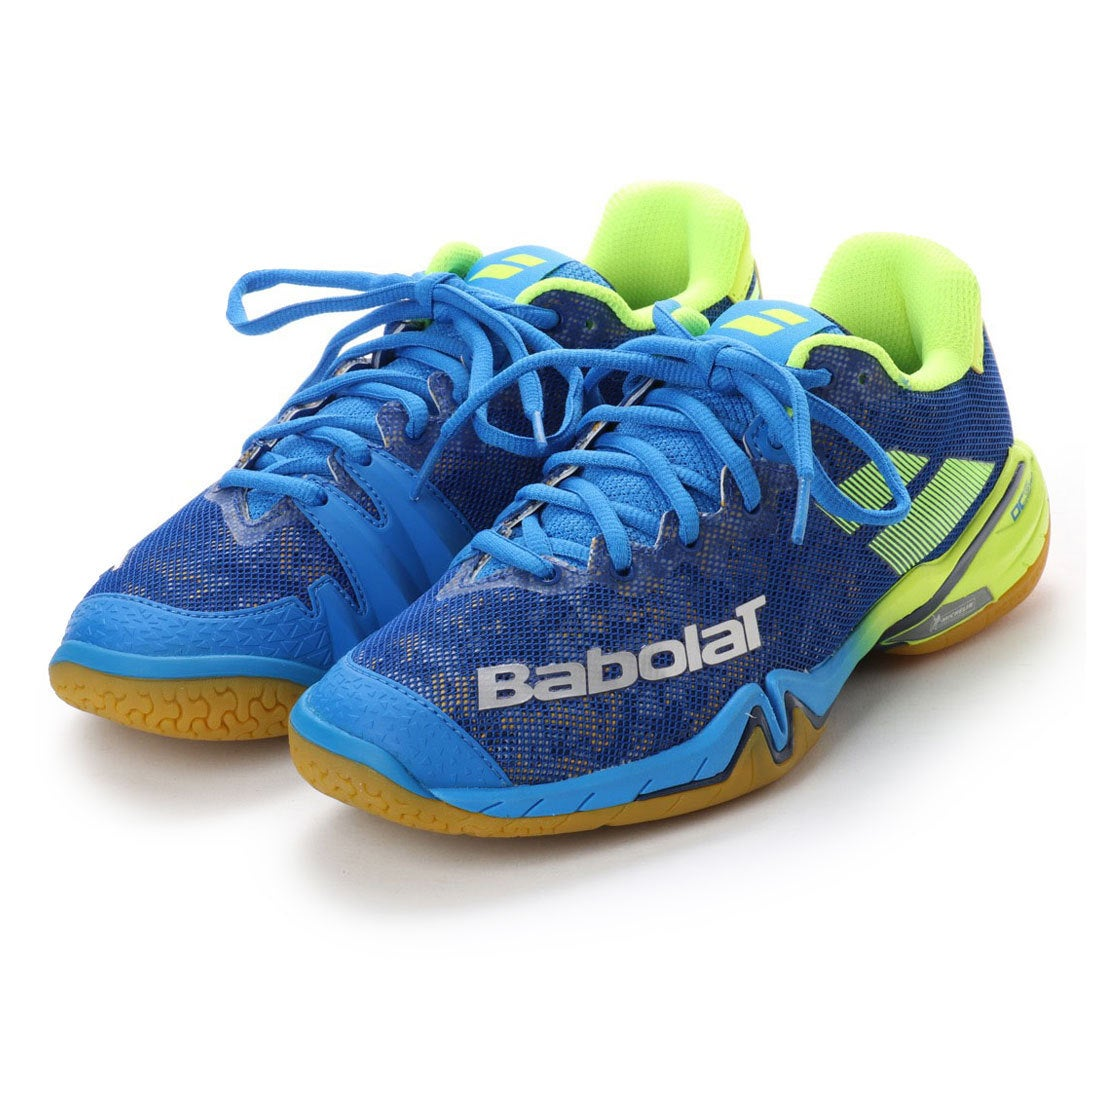 【SALE 10%OFF】バボラ Babolat メンズ バドミントン シューズ シャドウツアー BASF1801